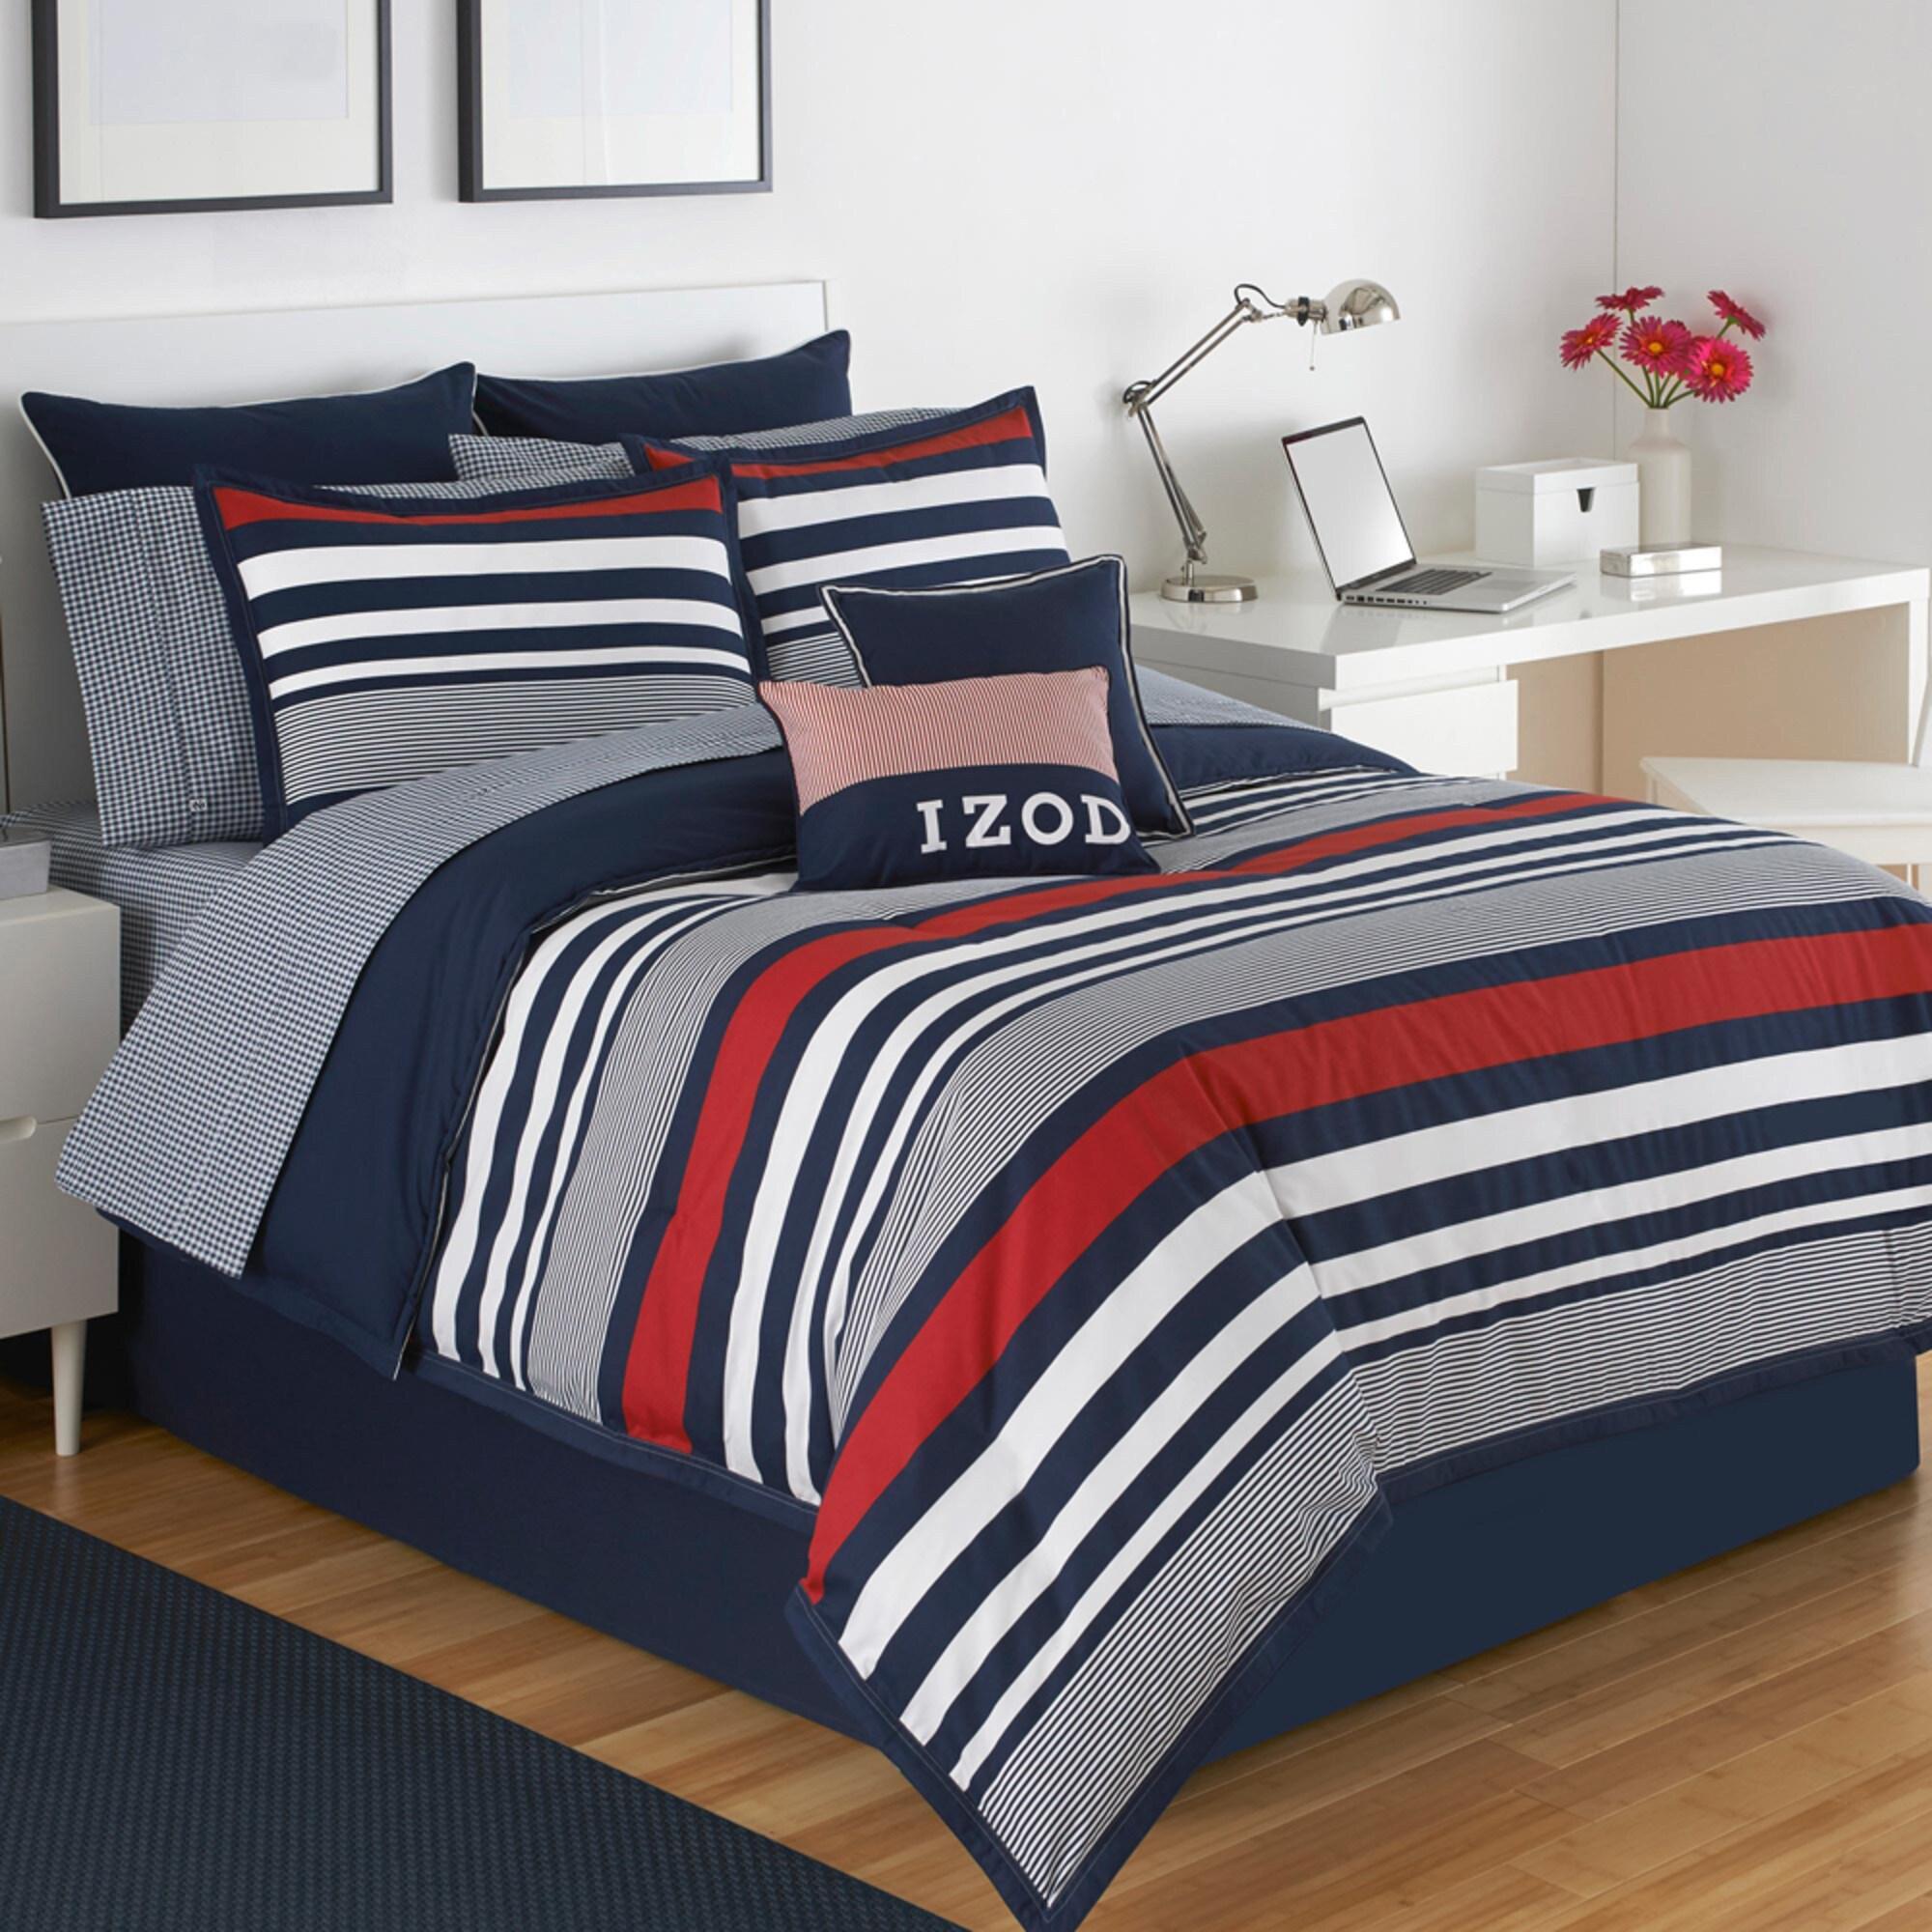 IZOD Varsity Stripe 4 Piece Comforter Set In Red, White, And Blue Stripes